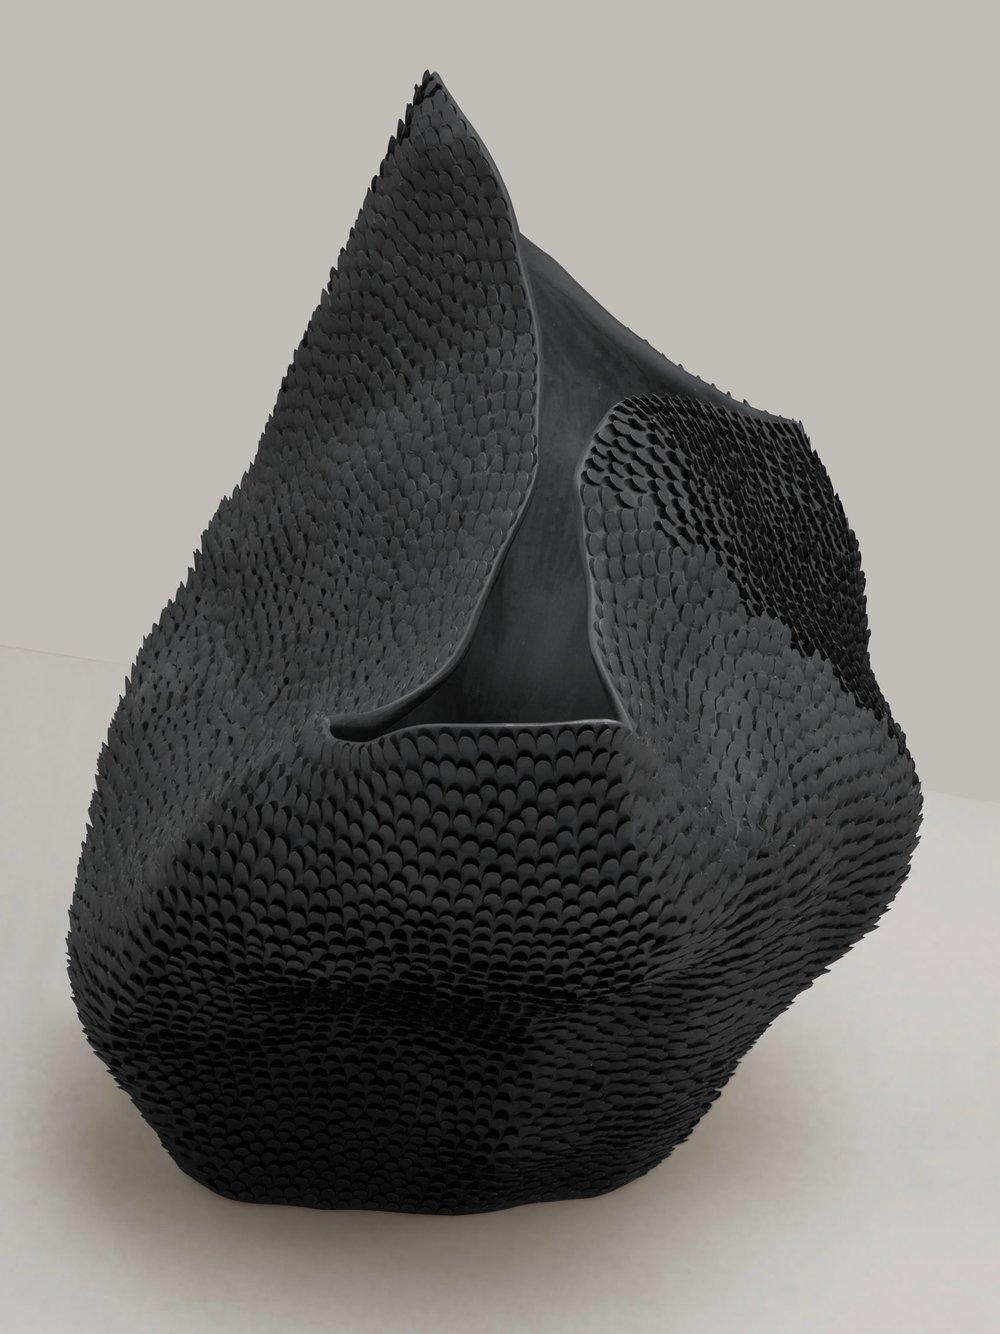 Pangolin Vase #2 <i><br>14.900 DKK</i>